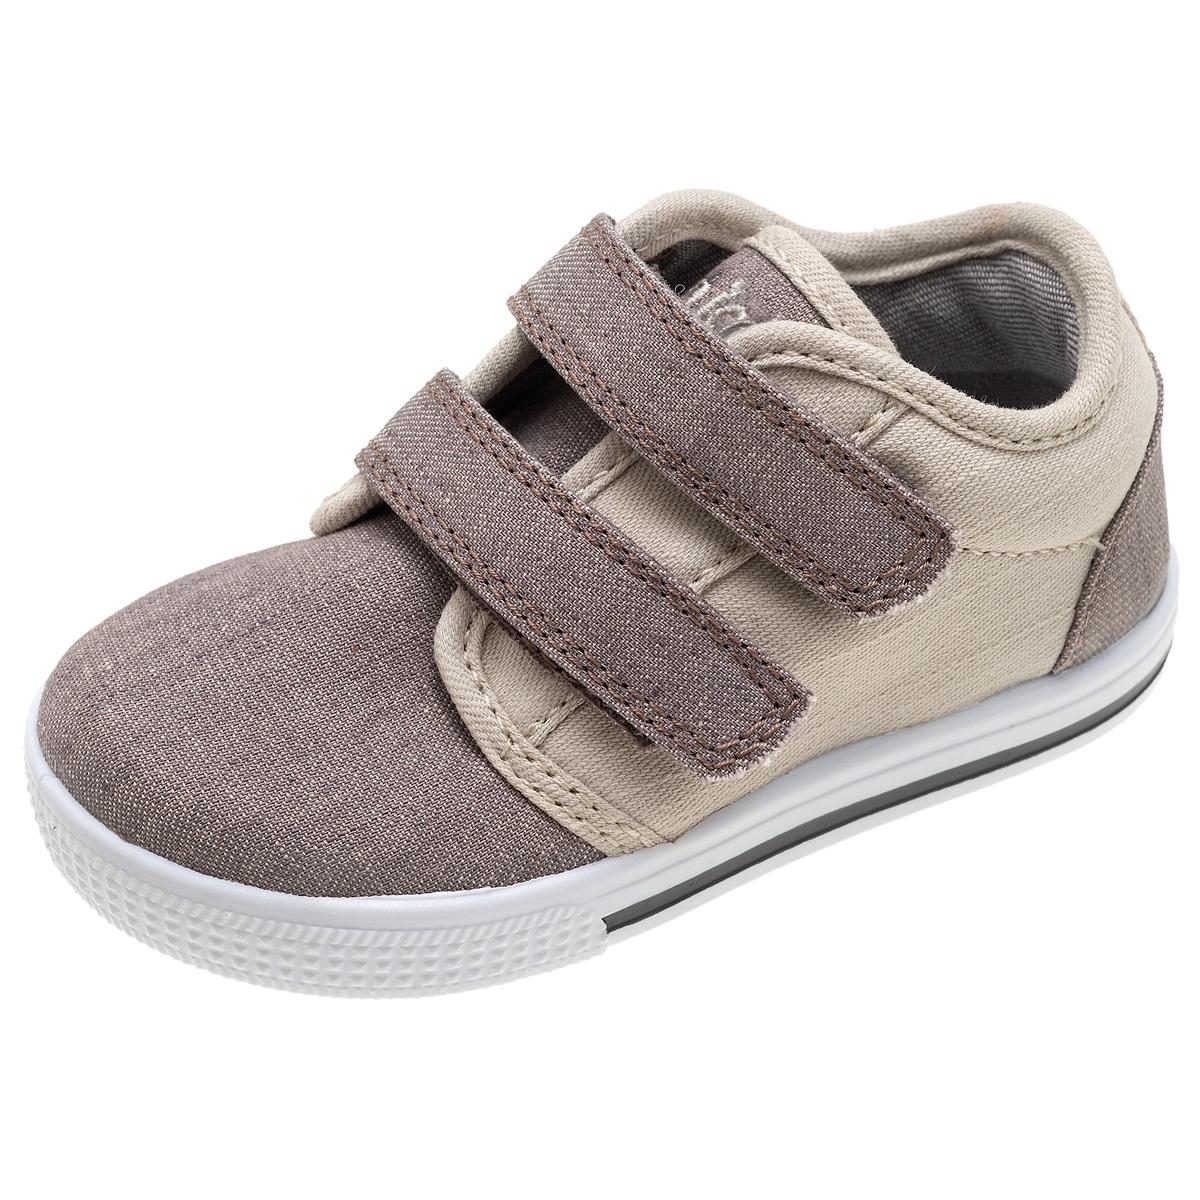 Pantof Sport Copii Chicco Filipo, Maro Cu Bej, 61689